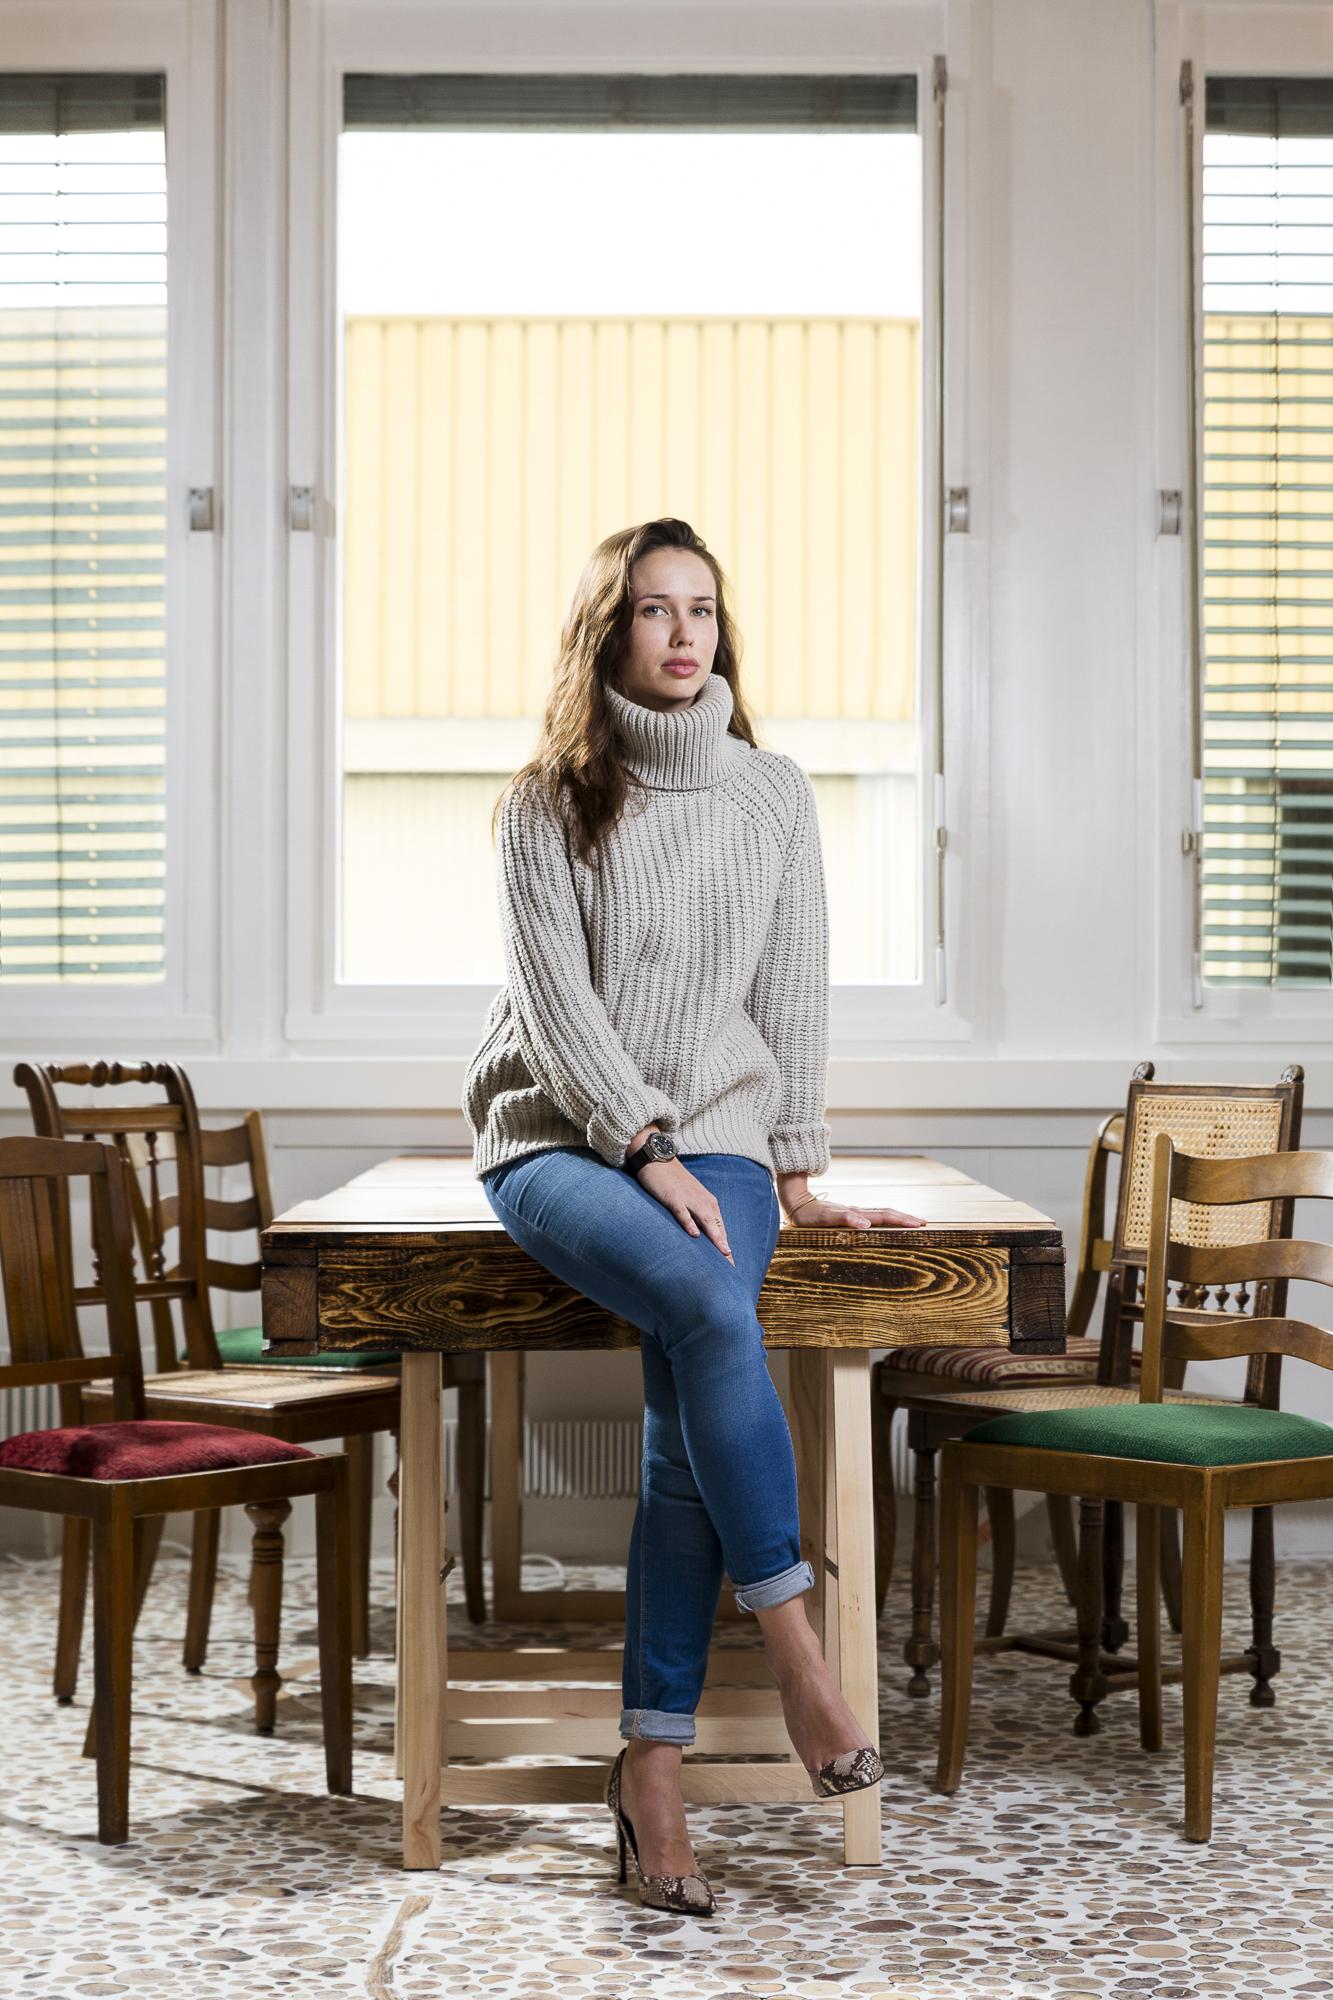 Alisée de Tonnac, CEO & Co-Founder of Seedstars